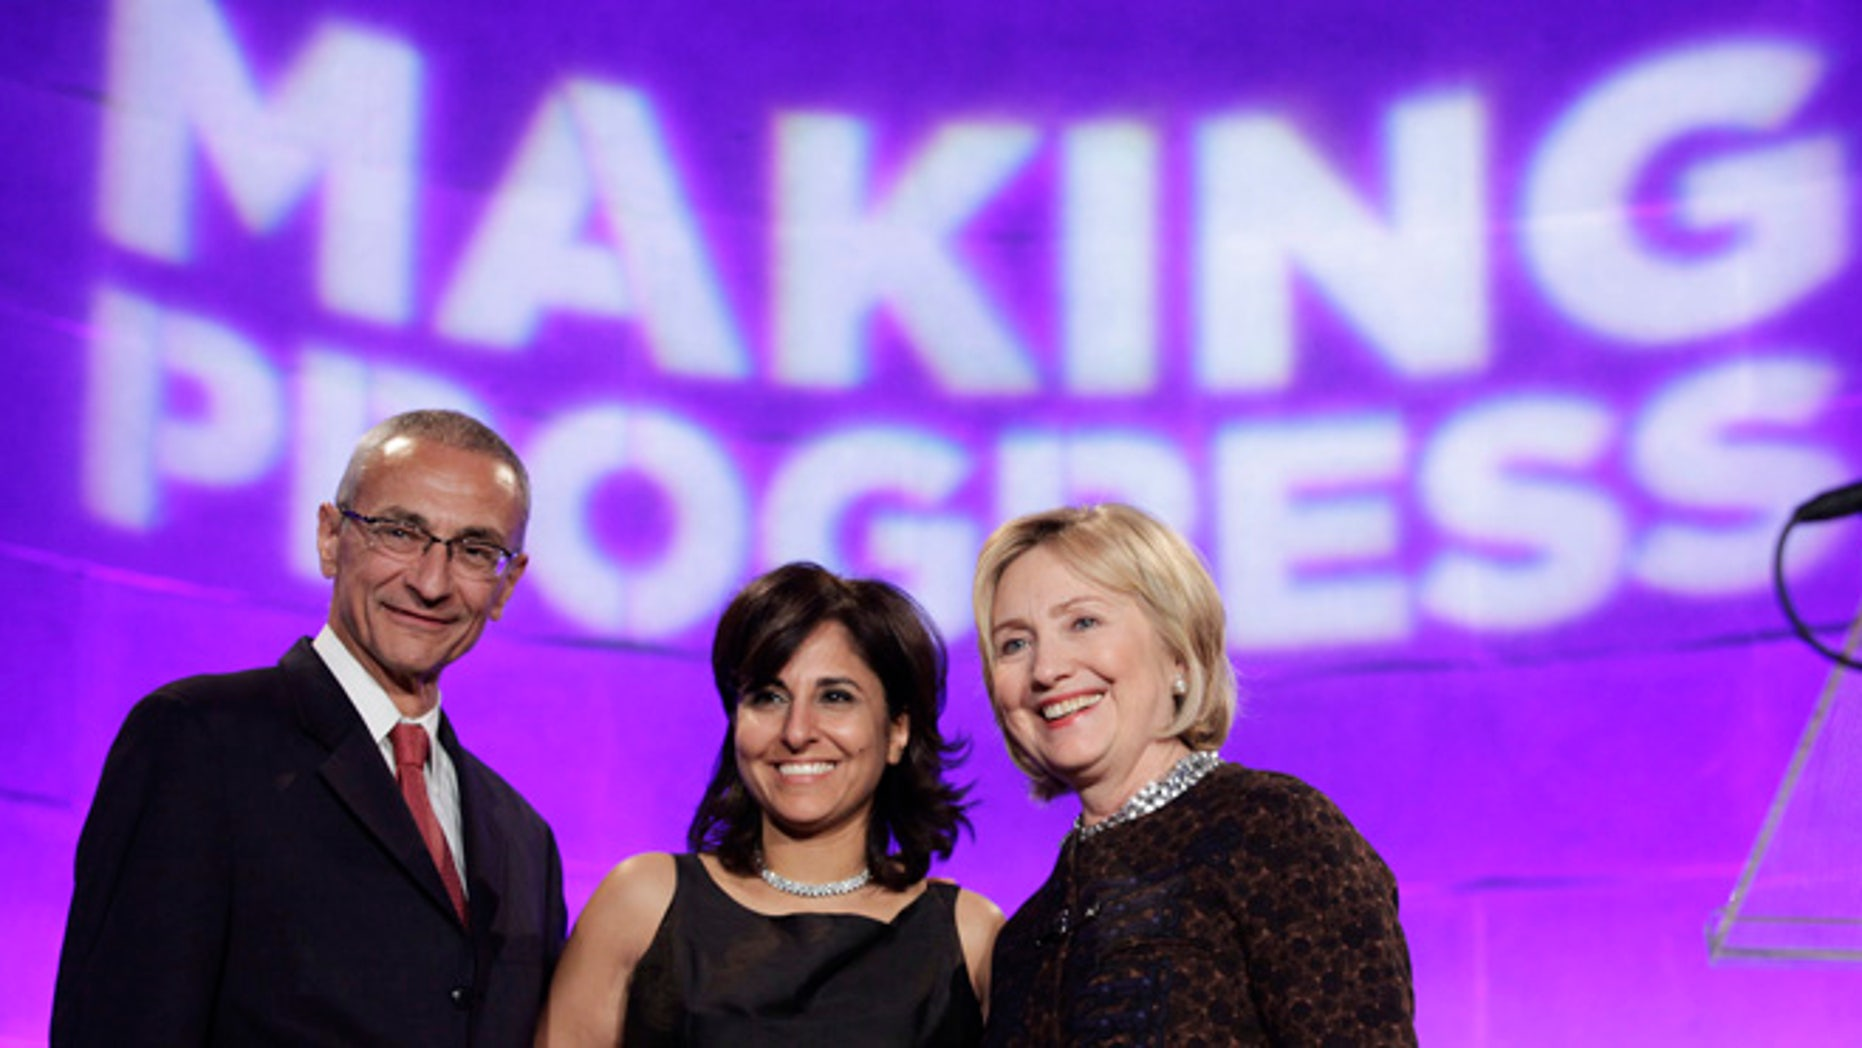 FILE: October 24, 2013: Hillary Clinton (r) with President of the Center for American Progress Neera Tanden and CAP founder John Podesta, Washington, D.C. REUTERS